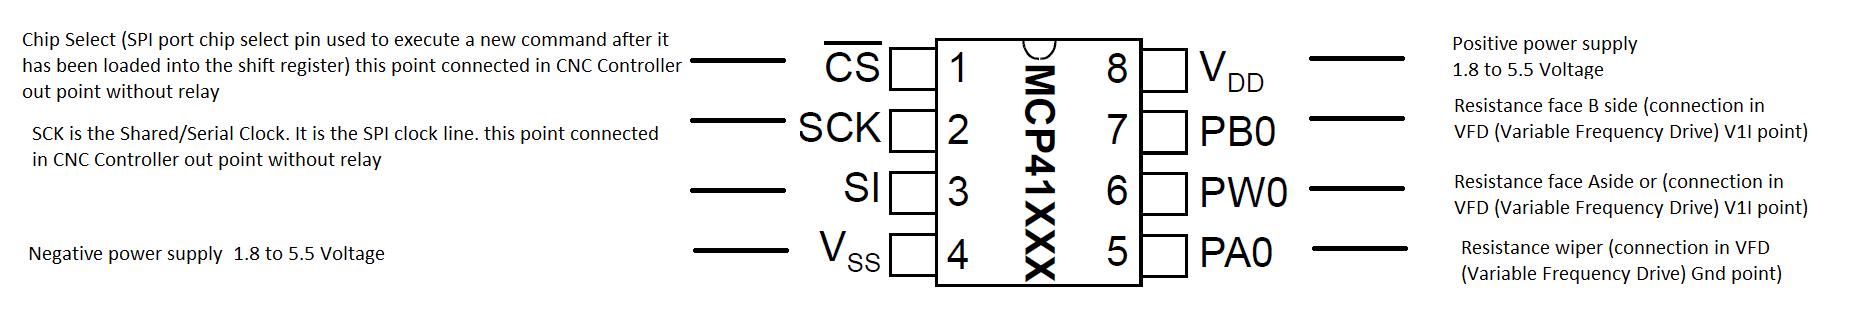 mcp41xx-digital-potentiometer-pinout – Copy